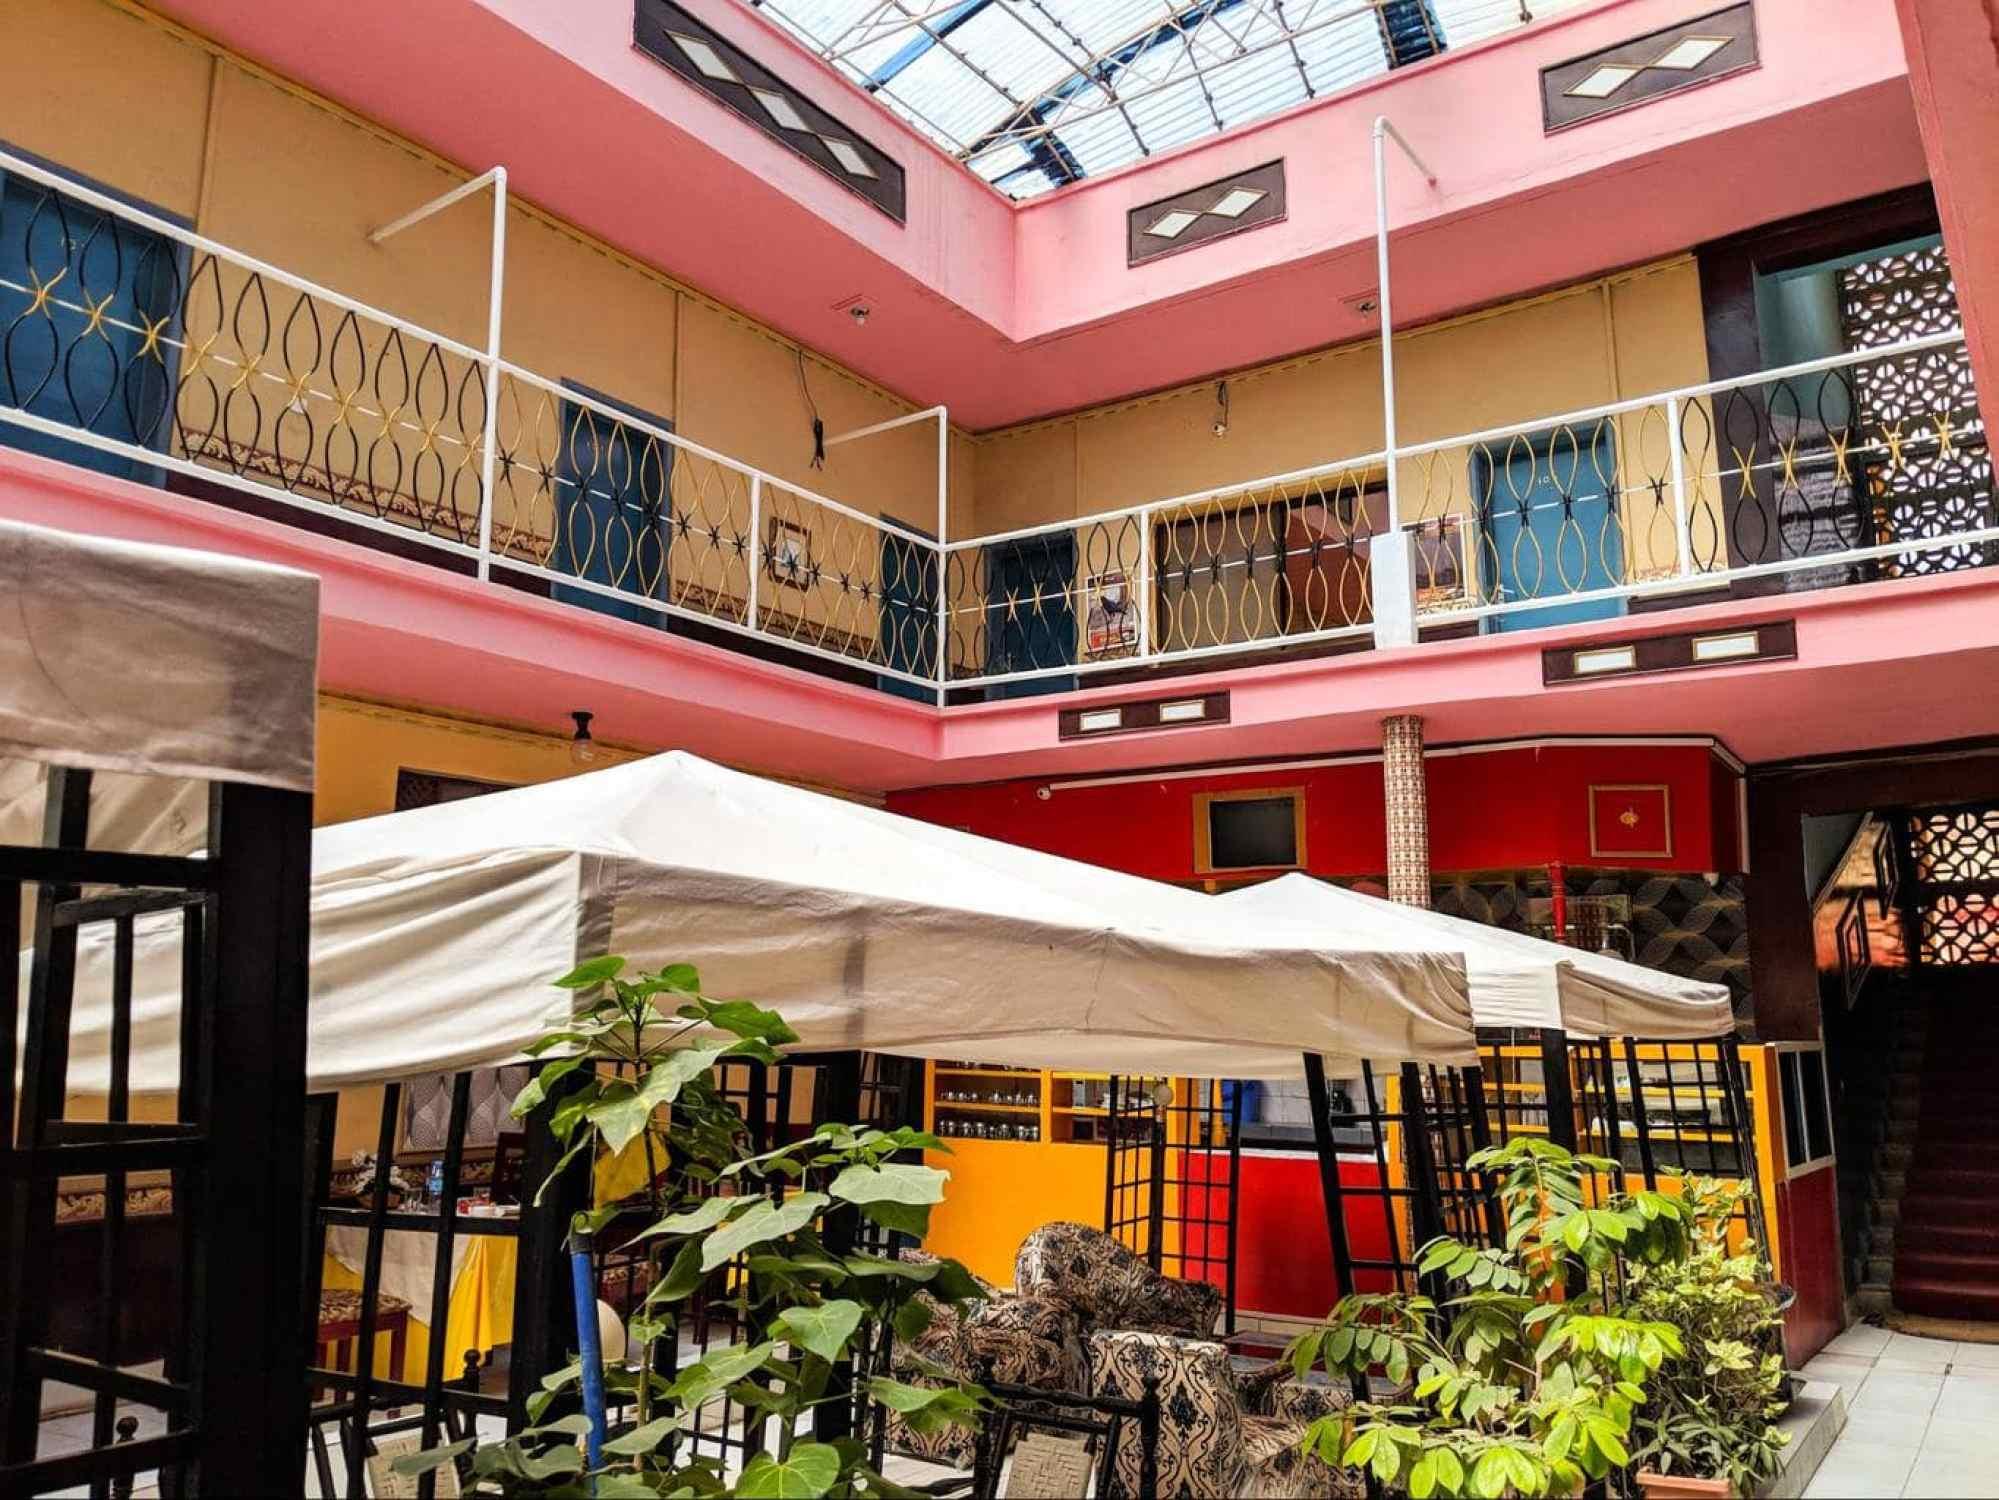 The popular Oriental Hotel in Hargeisa